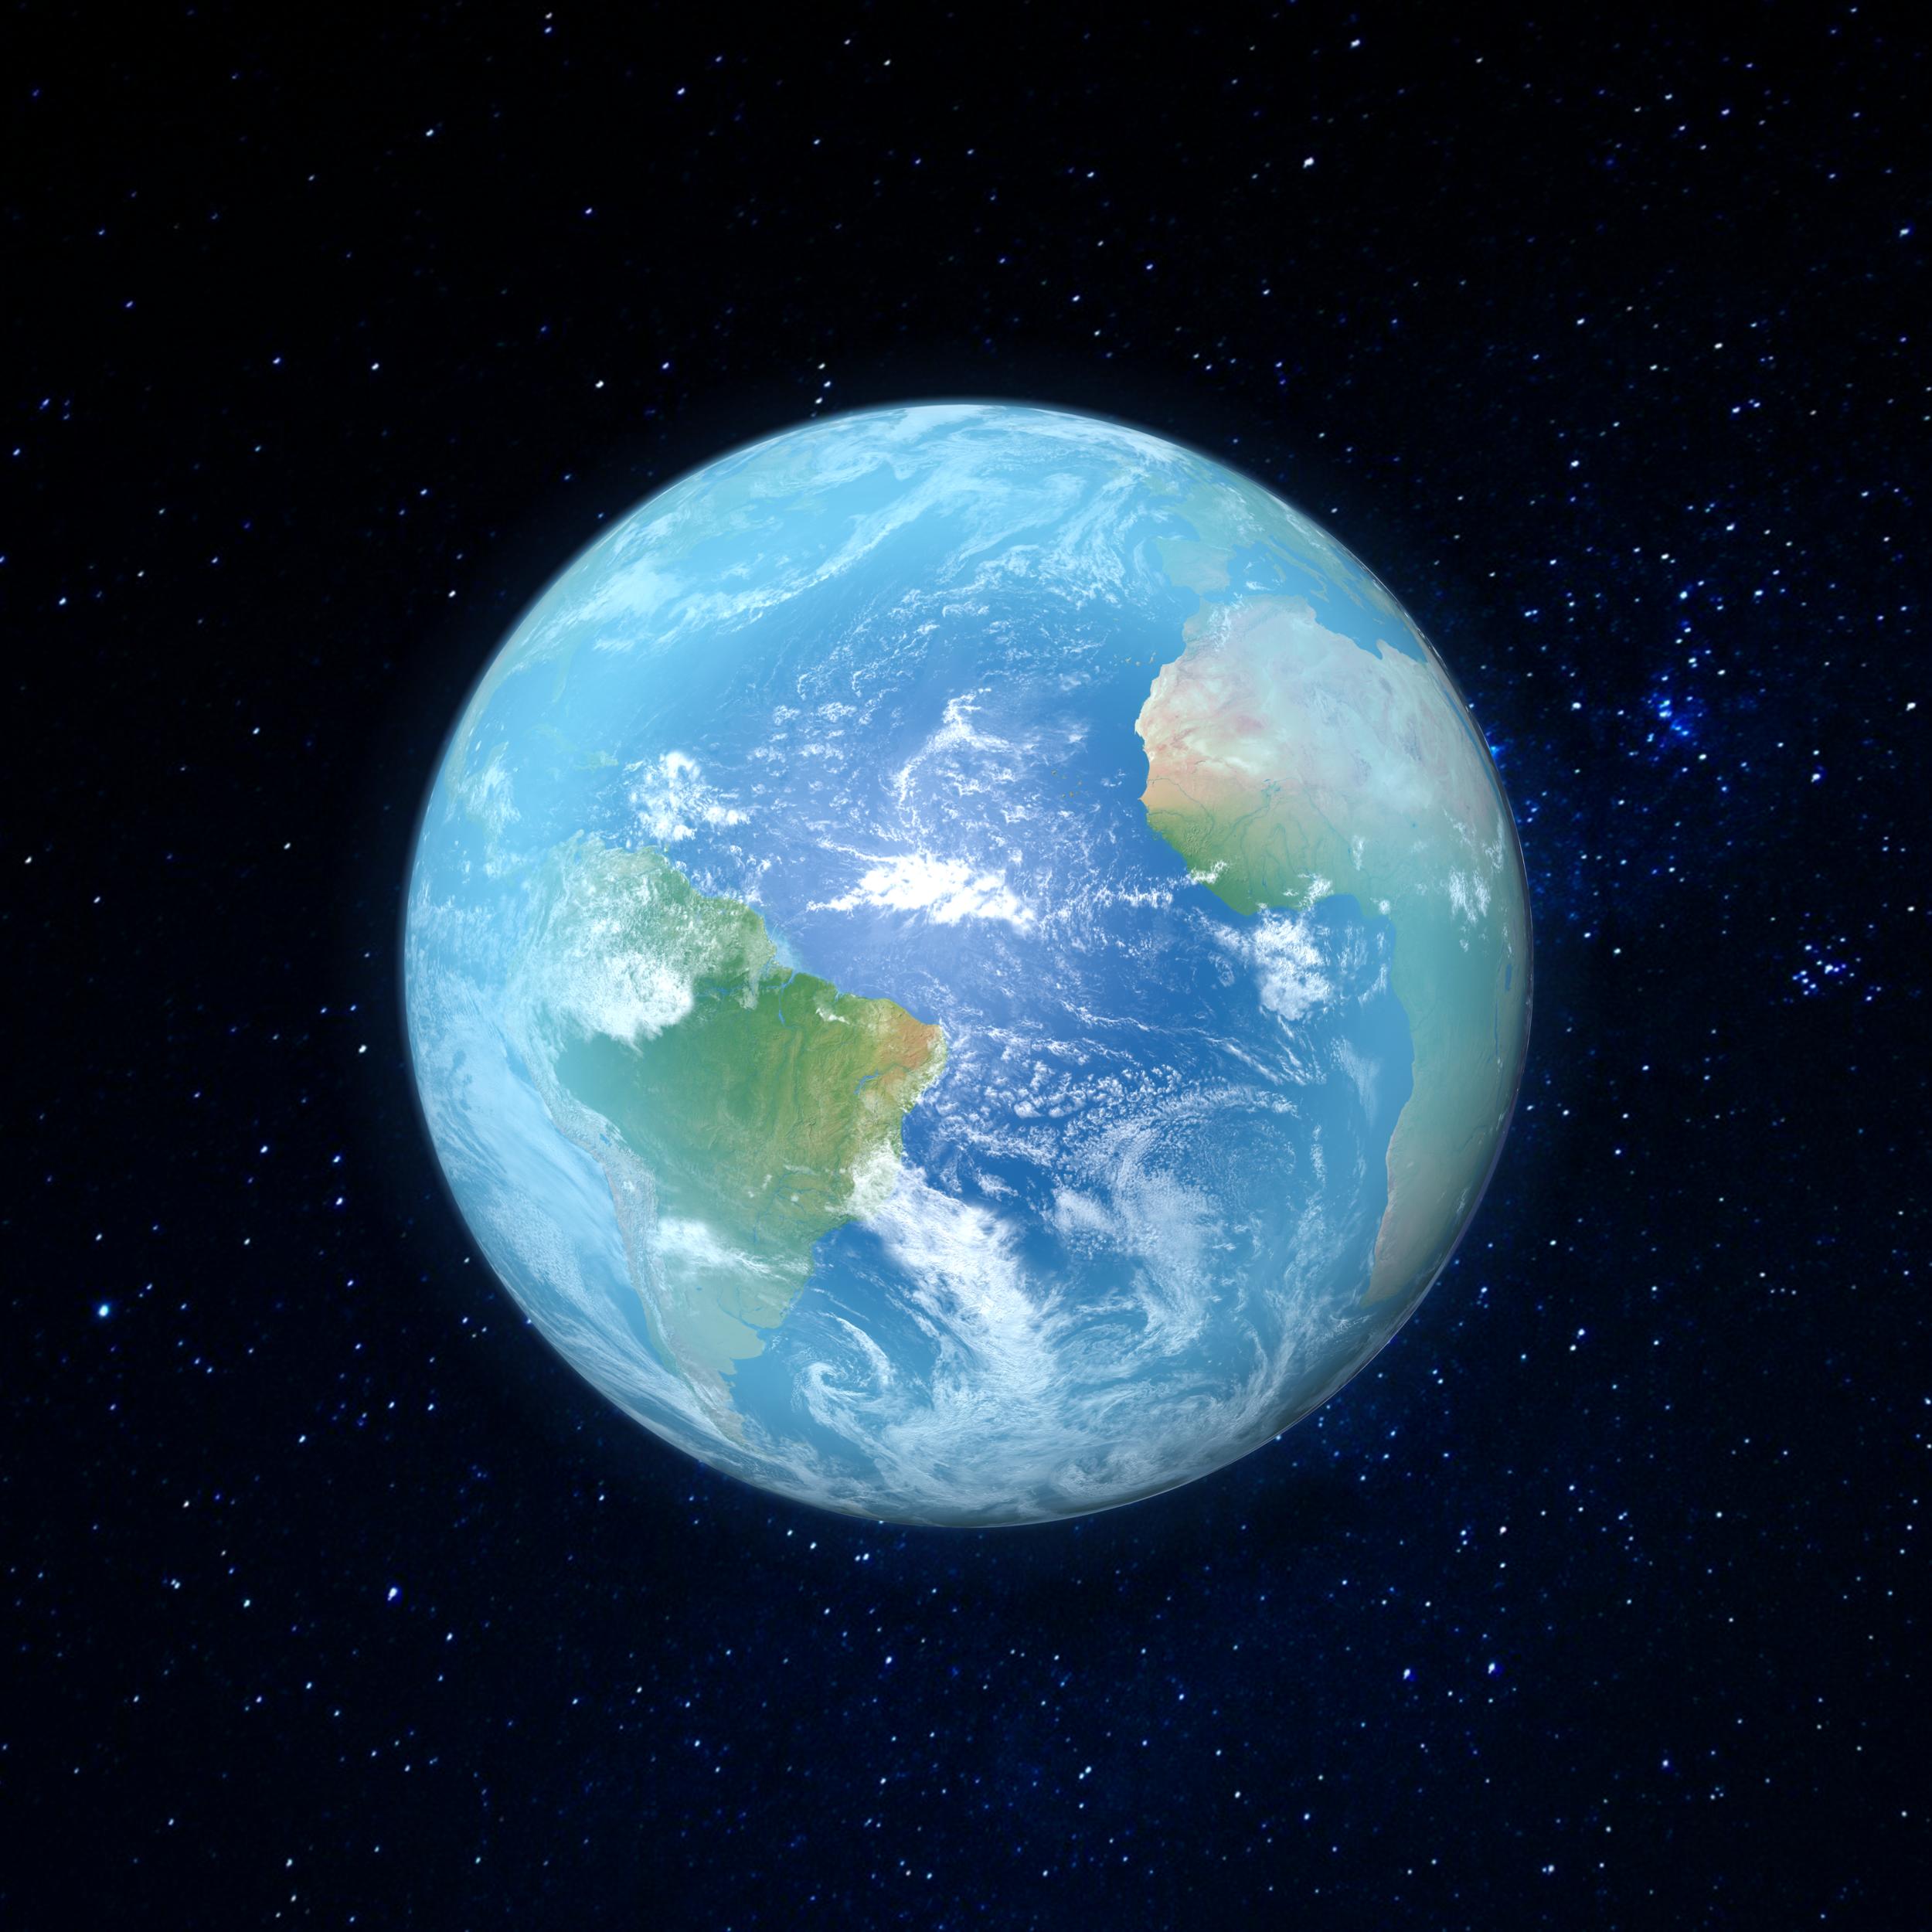 Earth_orbit_4000x4000_0300.png